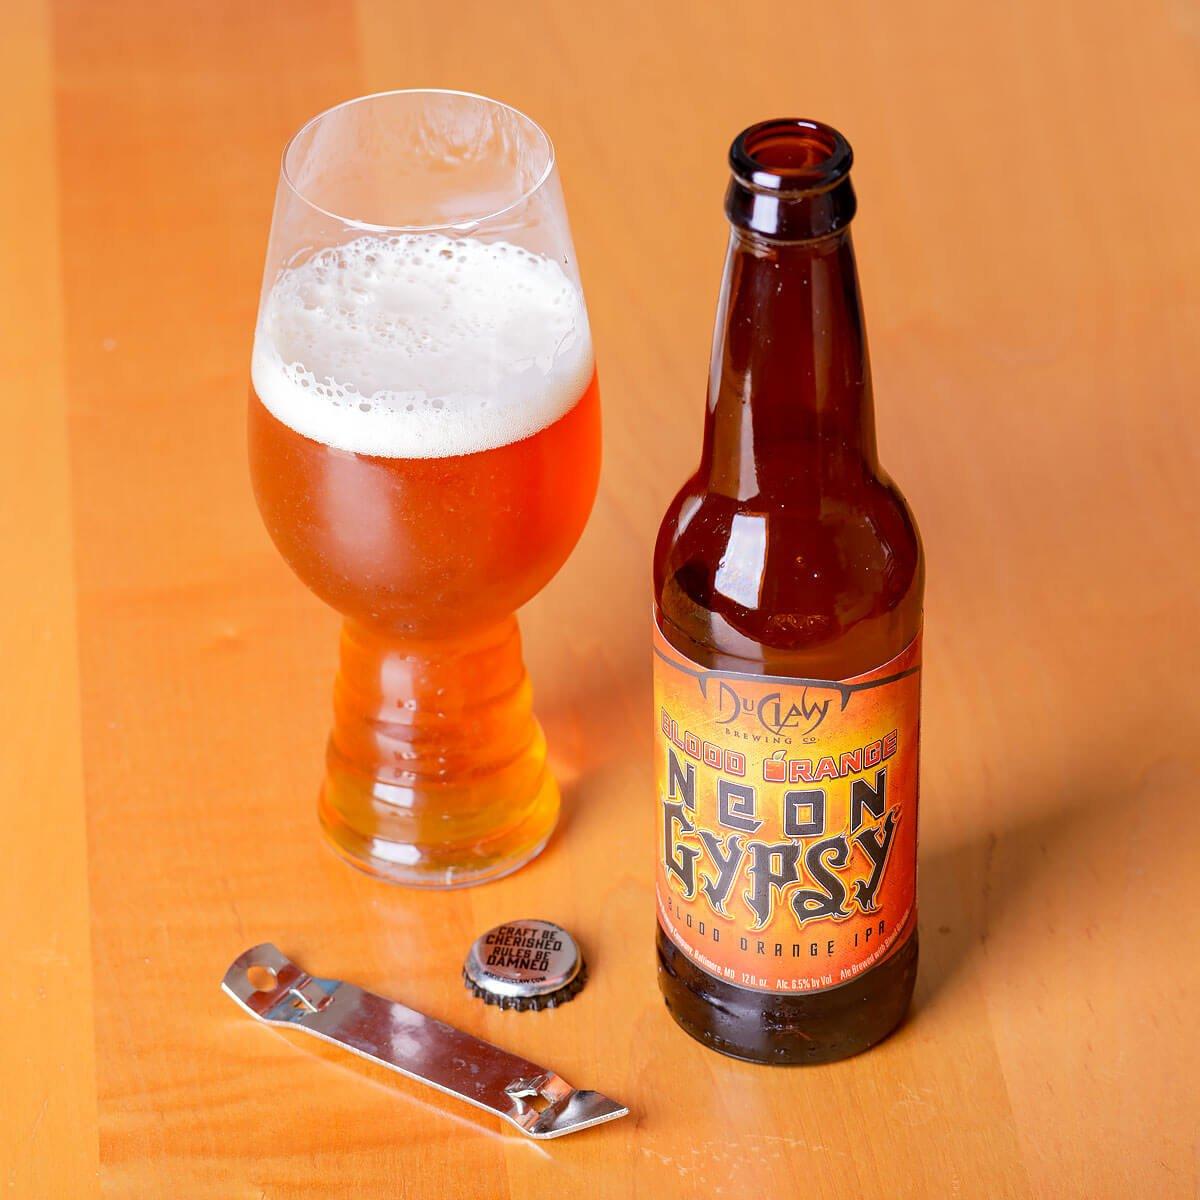 Blood Orange Neon Gypsy, an American IPA by DuClaw Brewing Company